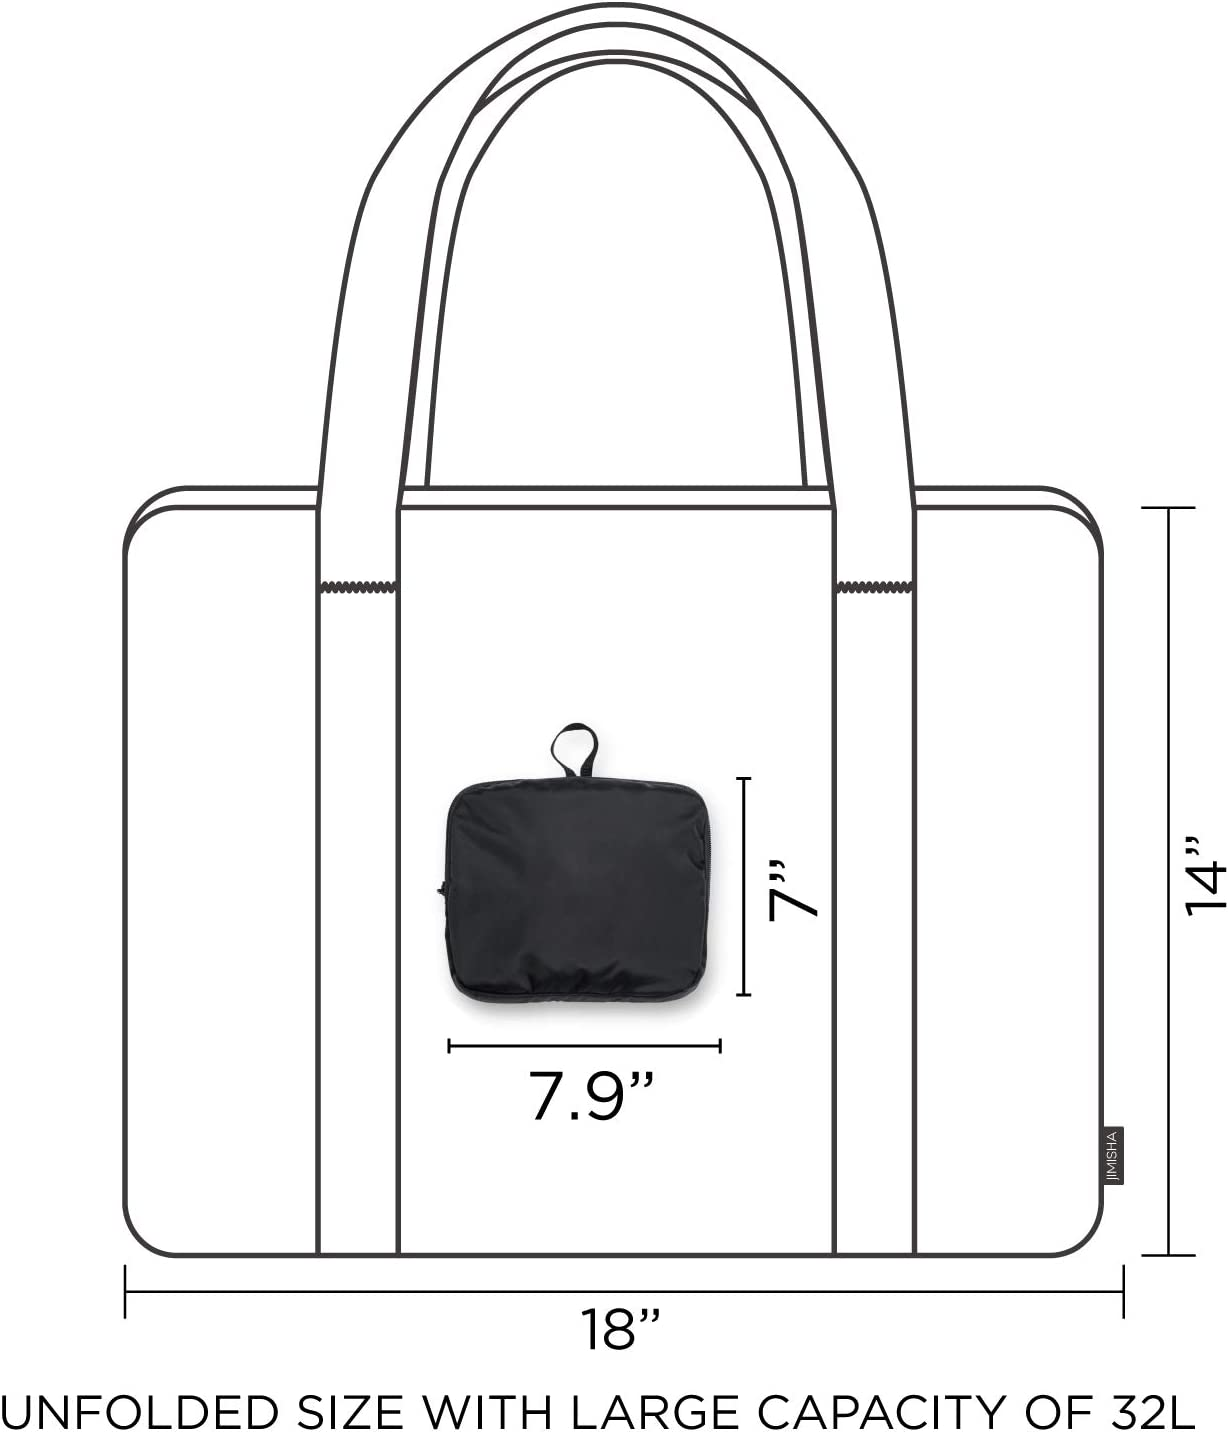 Blackwhite JIMISHA Travel Duffel Bag Lightweight Luggage Sports Gym Bag Water Resistant Nylon 32L Foldable Travel Bag